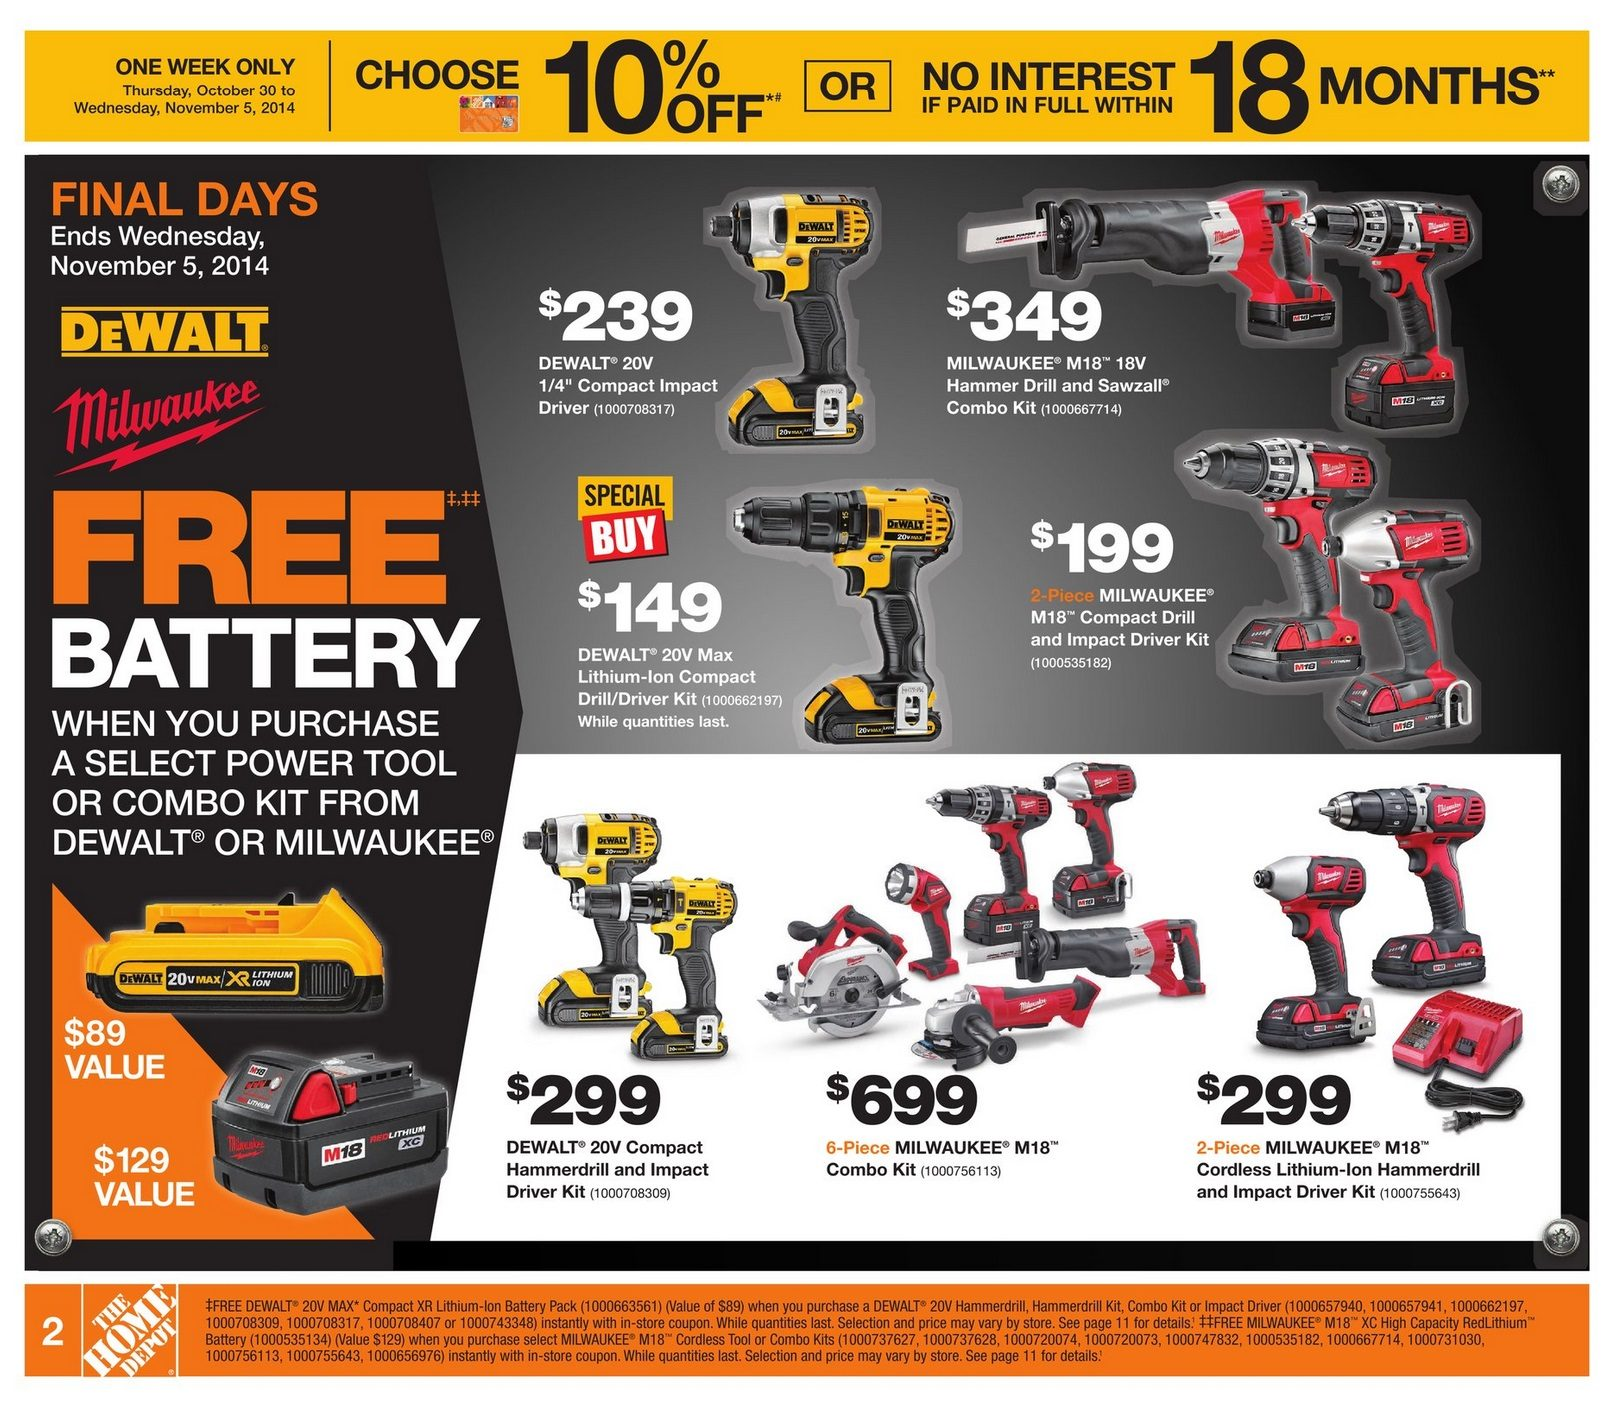 Home Depot Weekly Flyer Weekly Oct 30 – Nov 5 RedFlagDeals